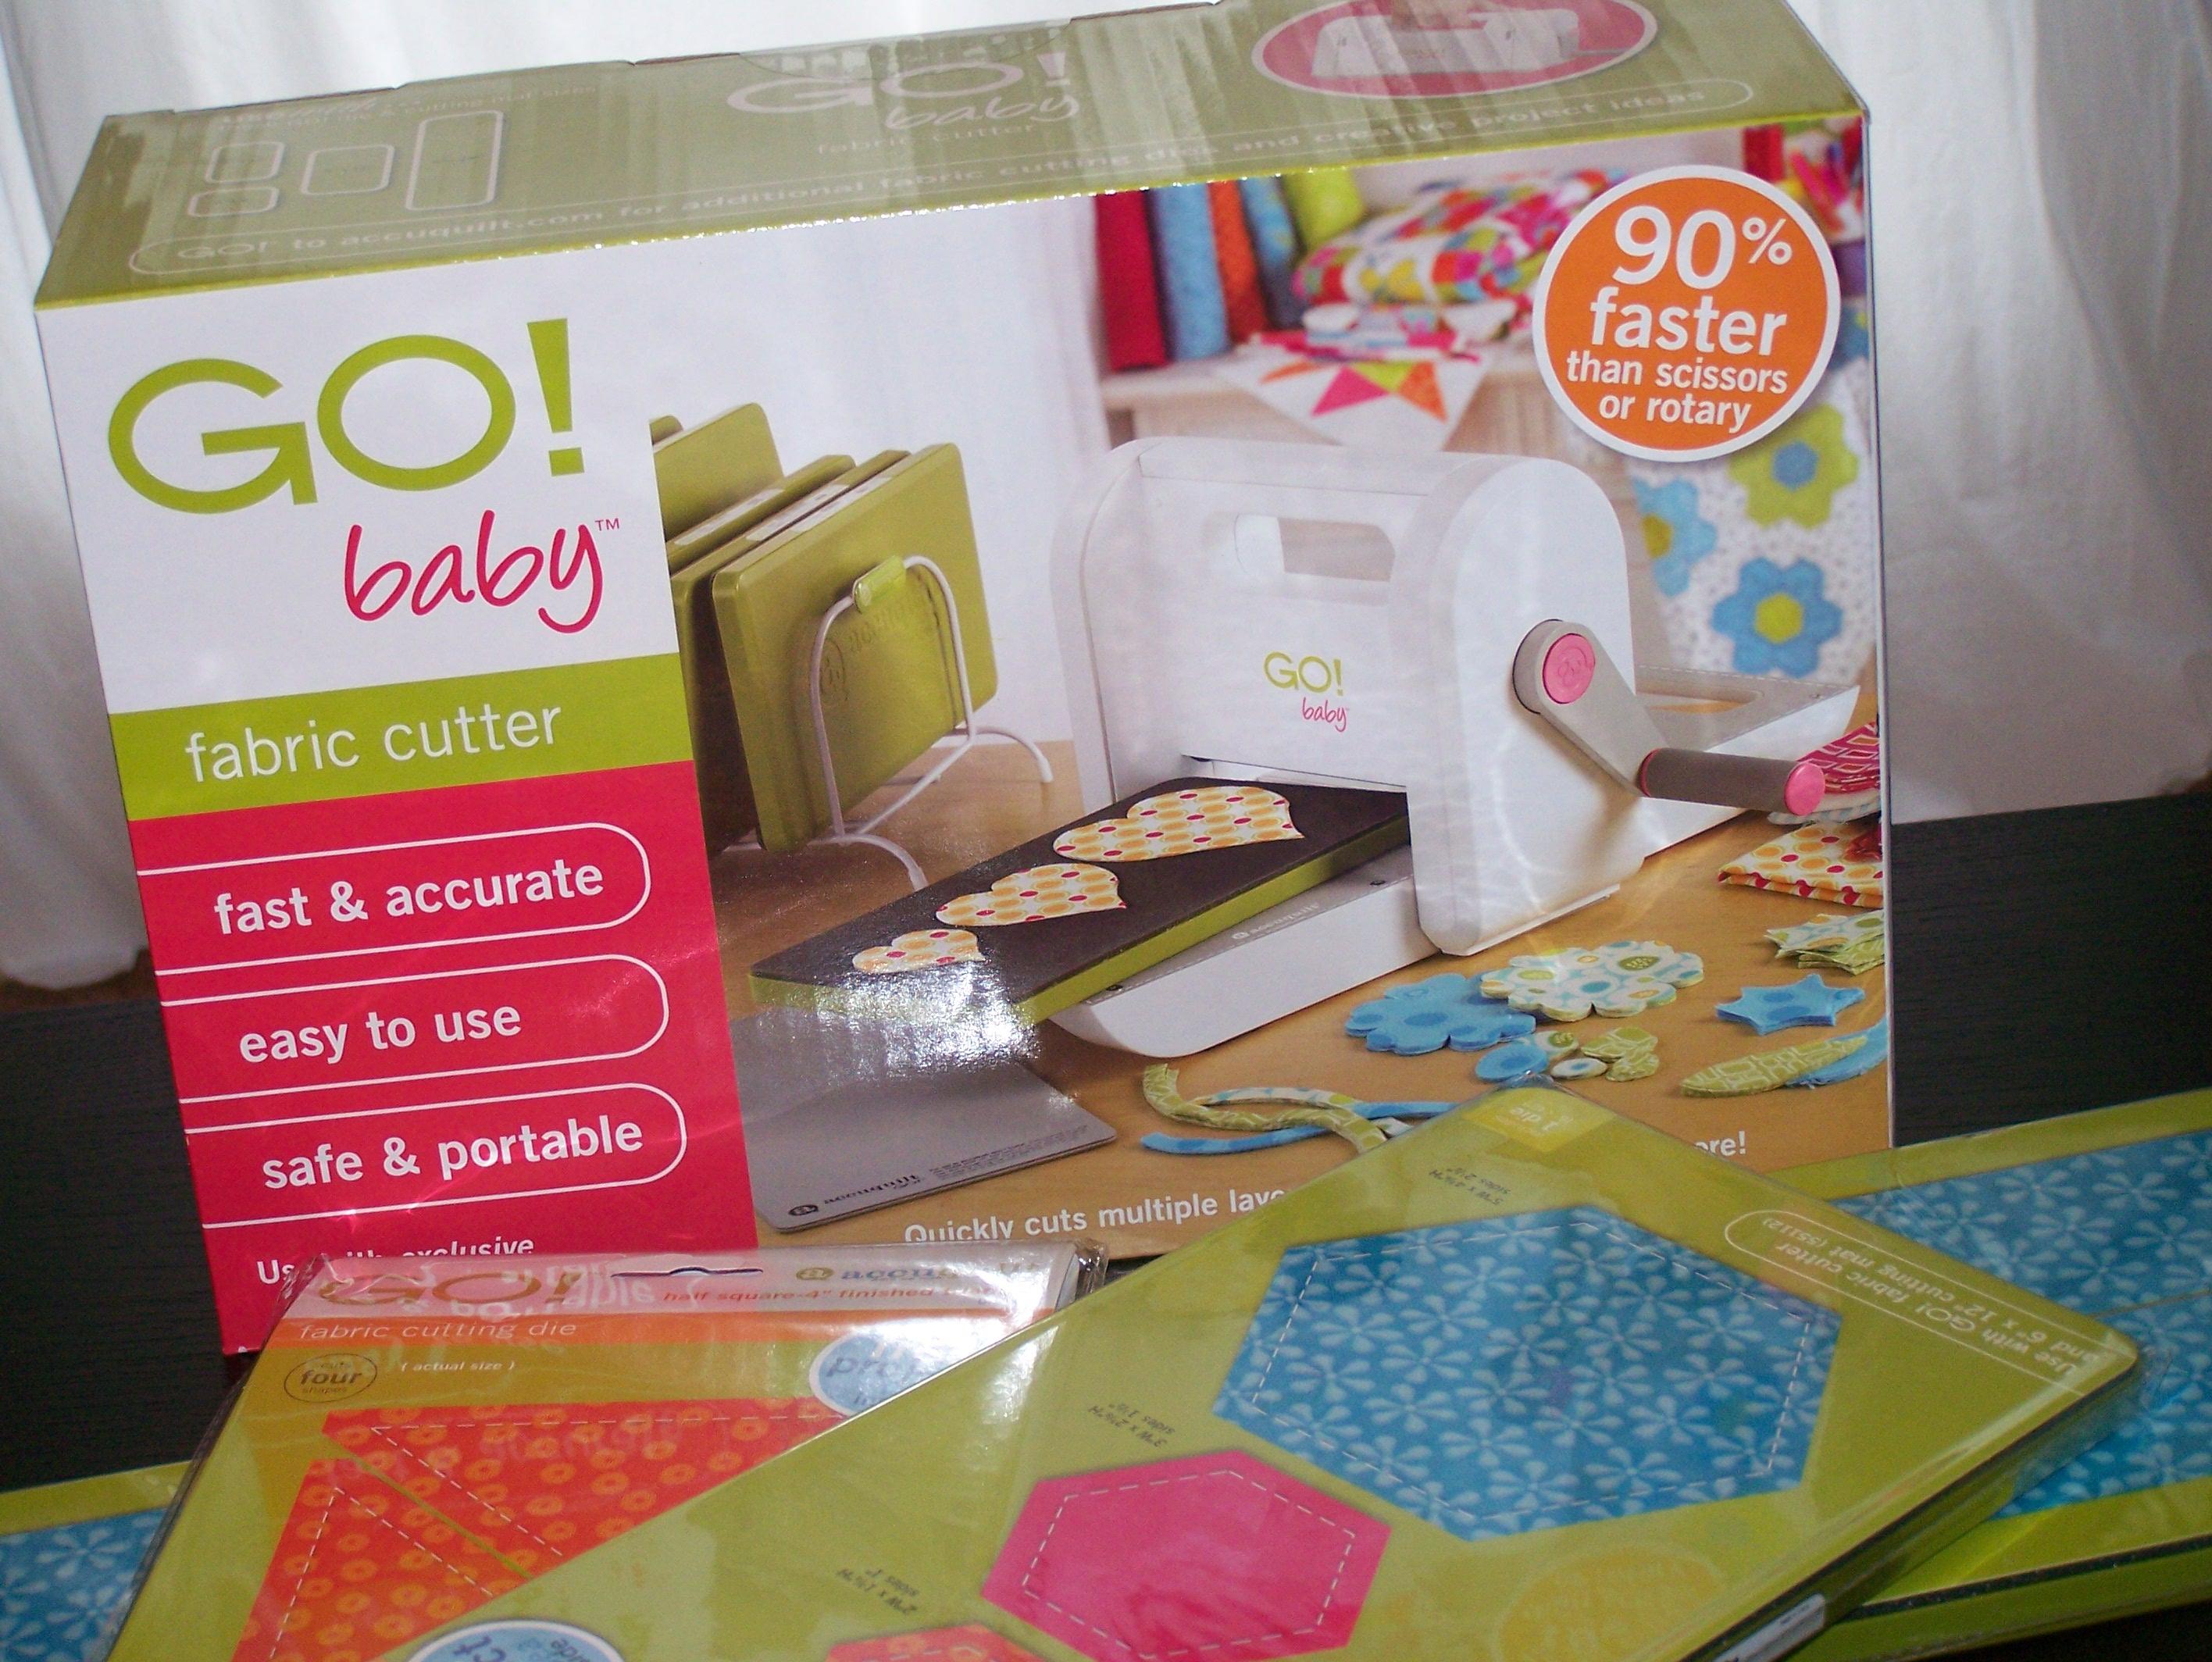 Accuquilt GO! Baby Fabric Cutter Review | Craft Buds : accu quilt go - Adamdwight.com